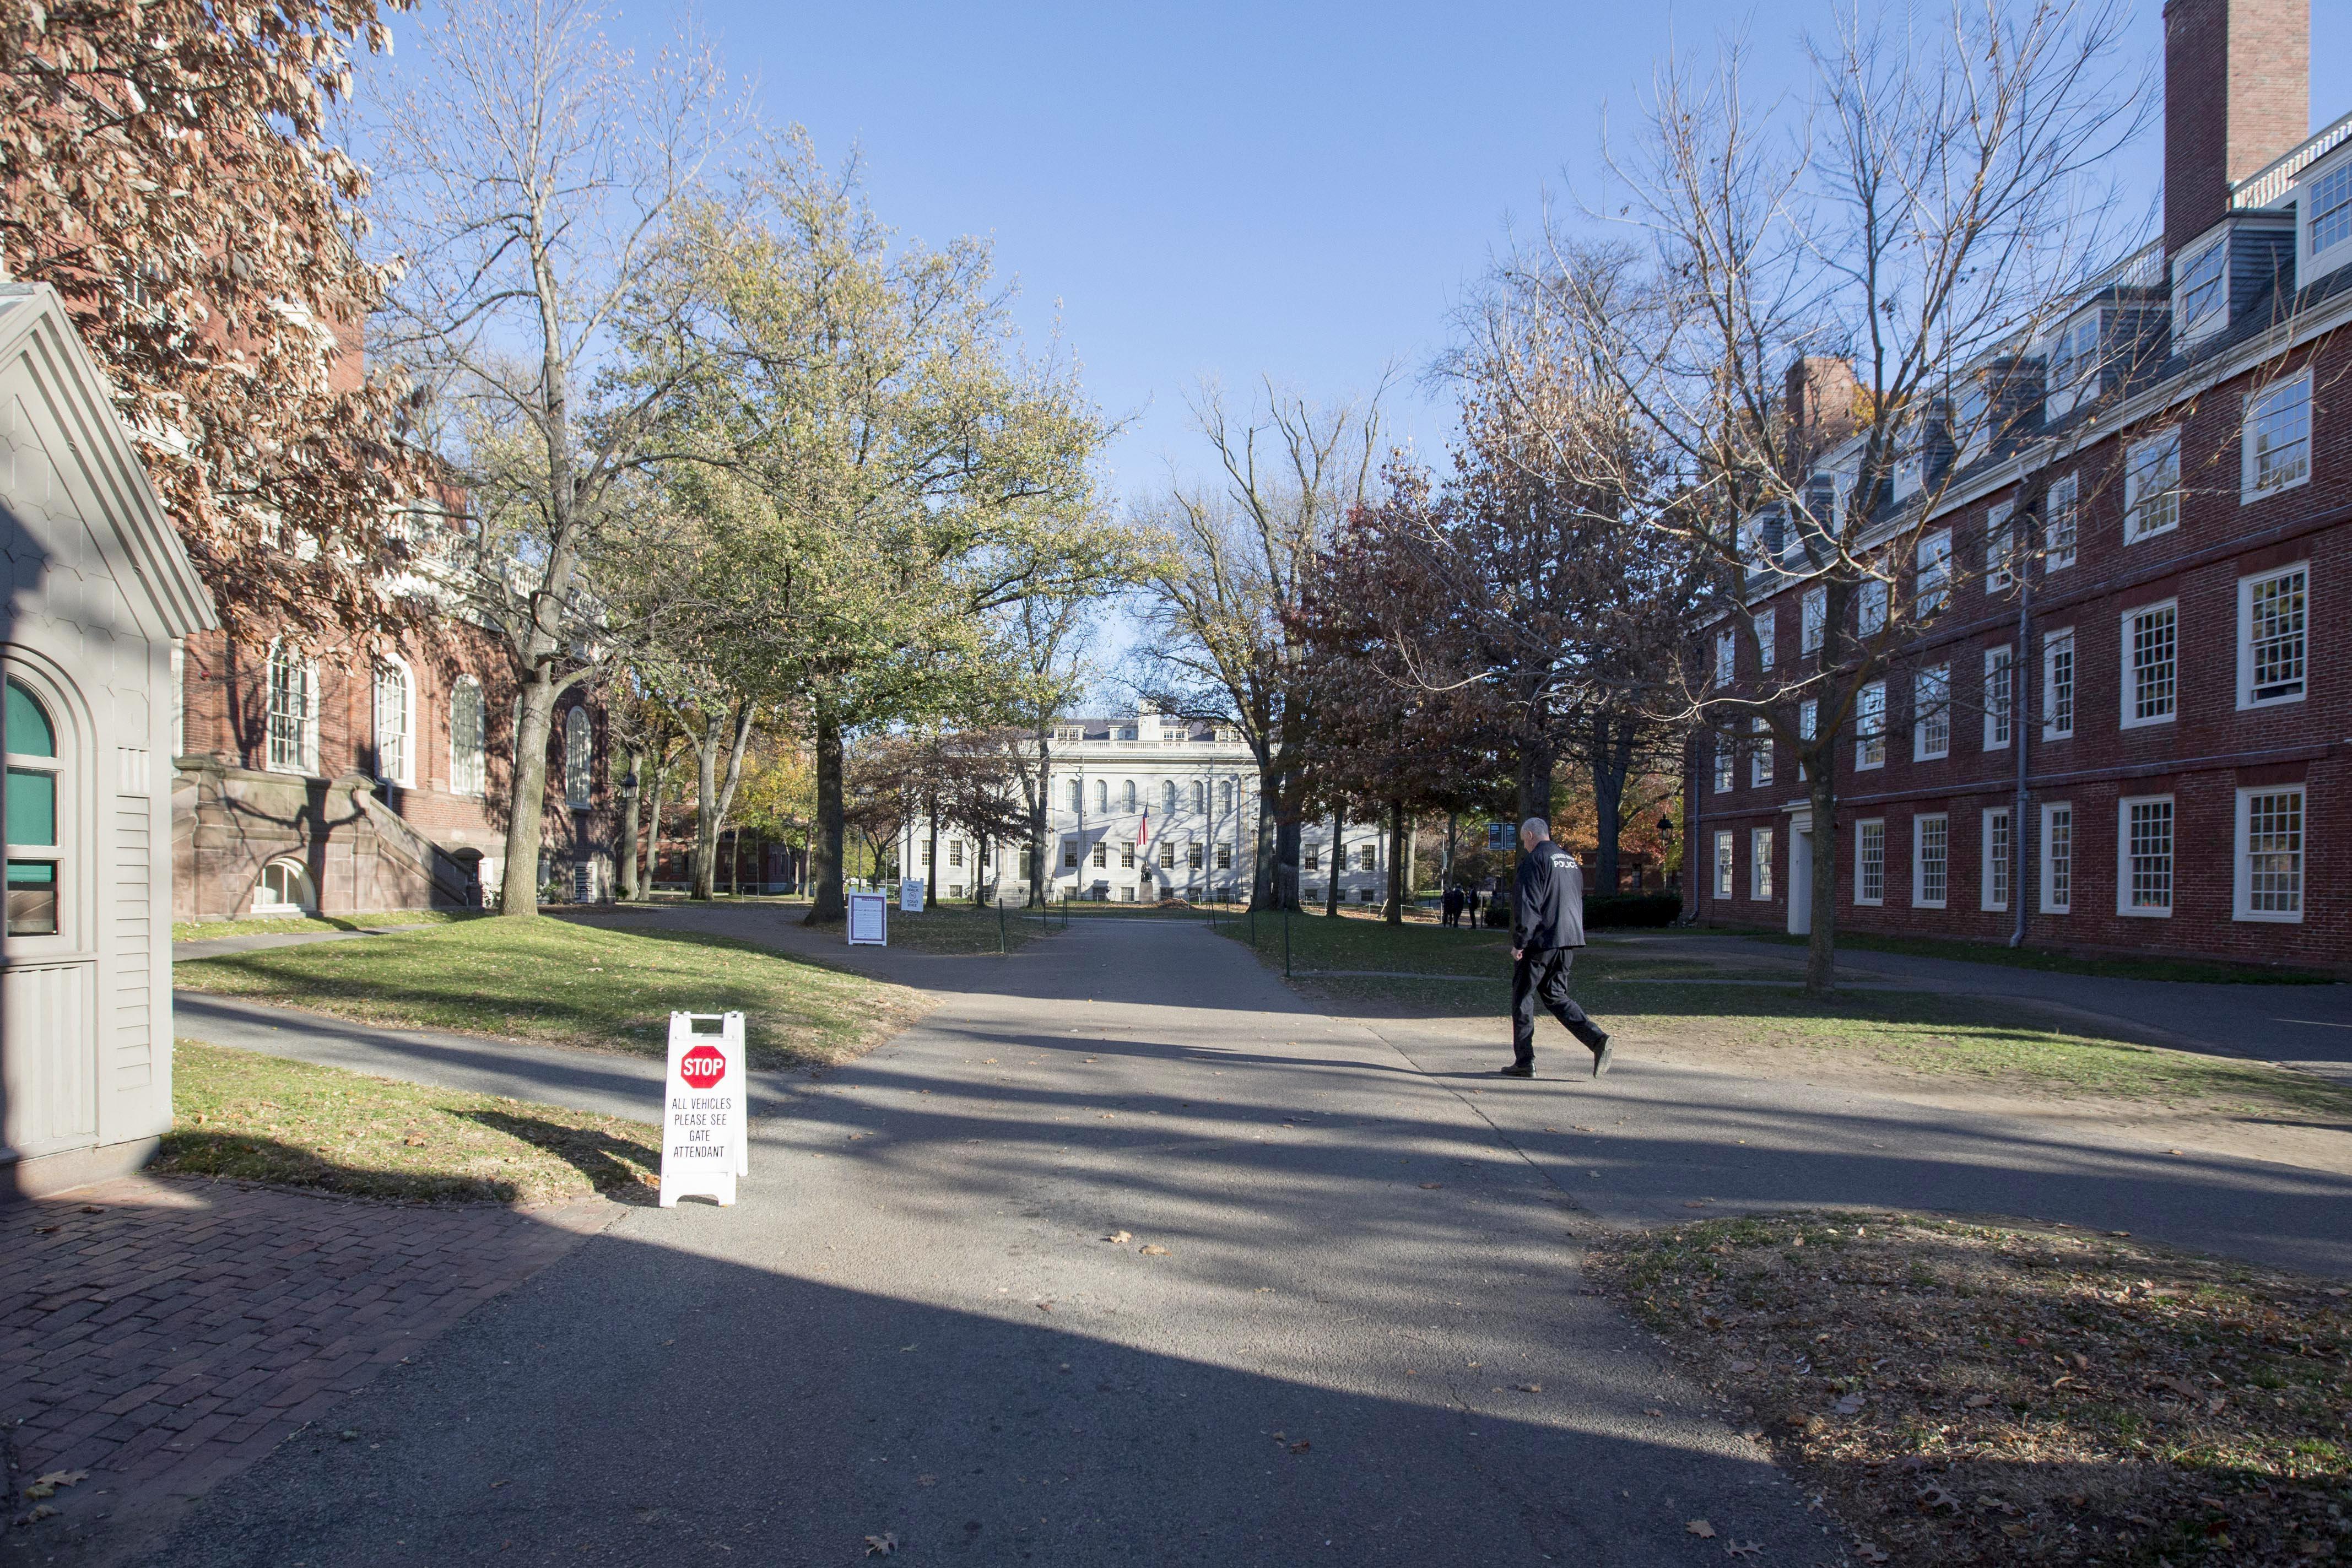 A Harvard University police officer walks through Harvard Yard.